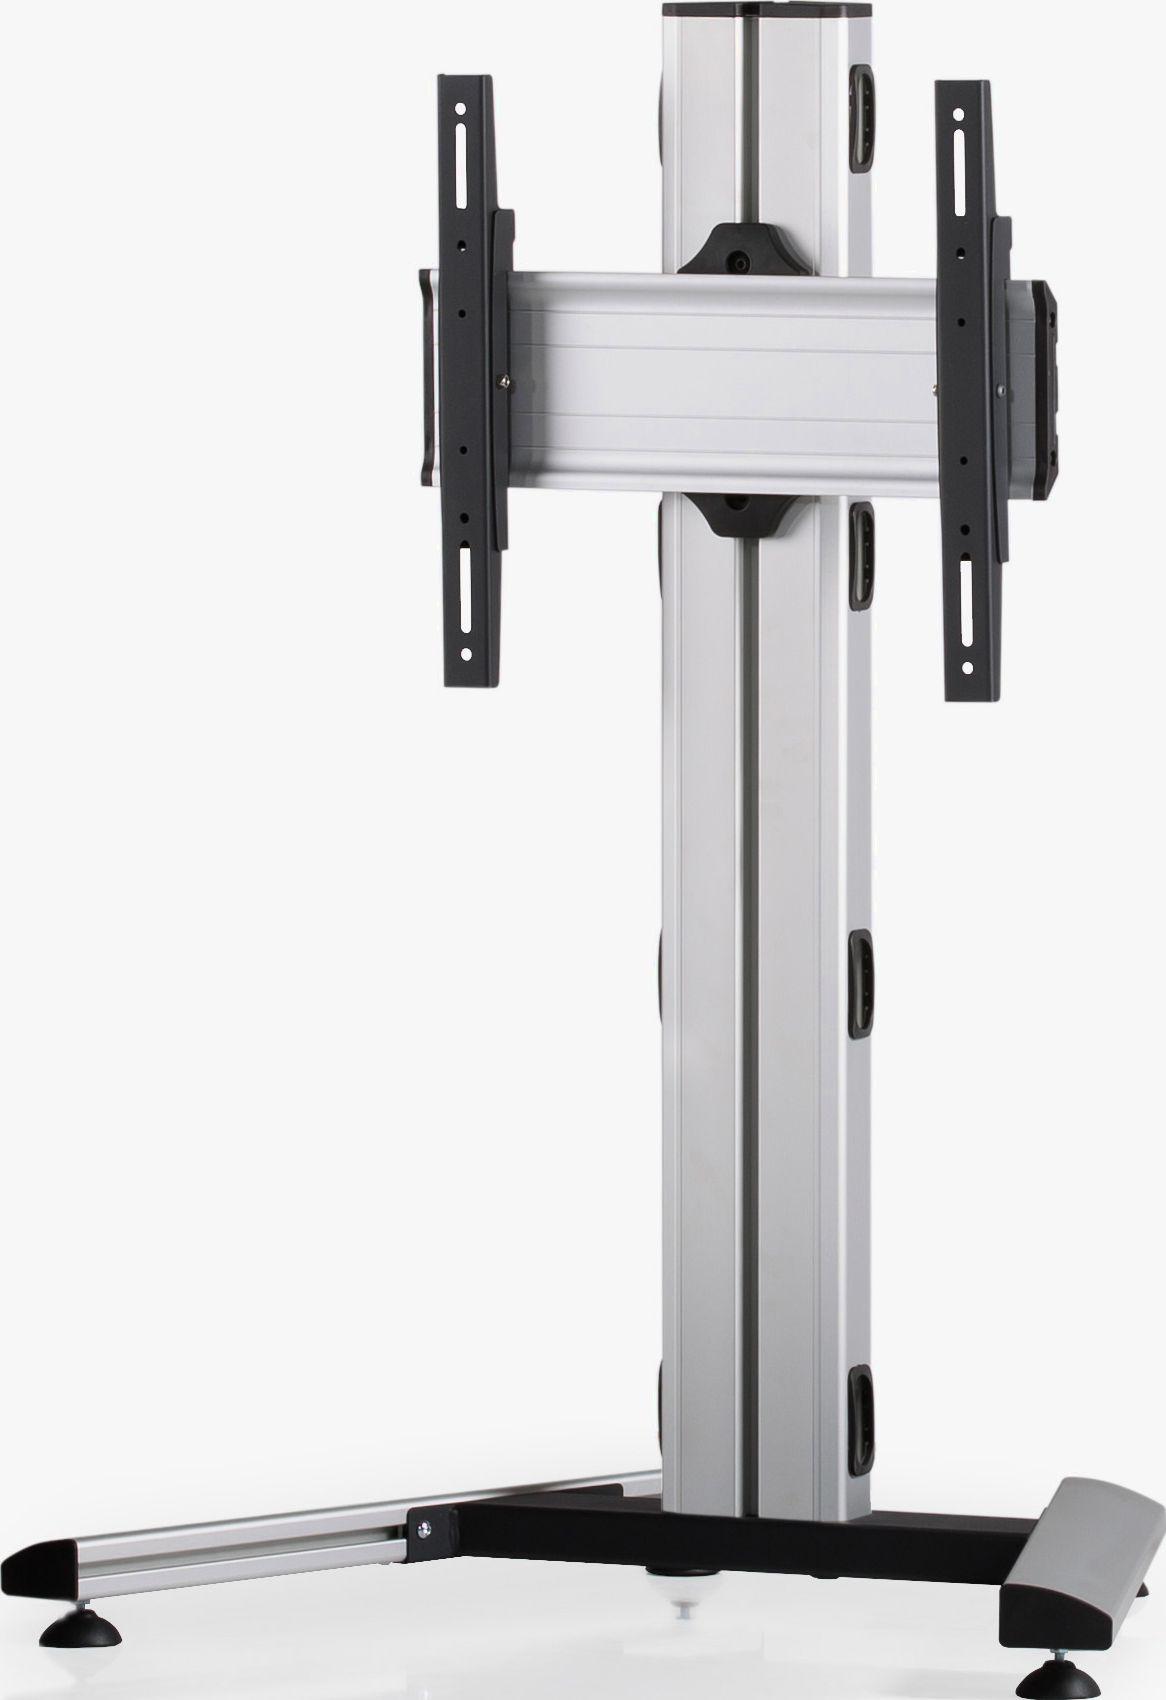 1 Display 1×1, Höhe 110 cm, Standard-VESA, auf Standfuß